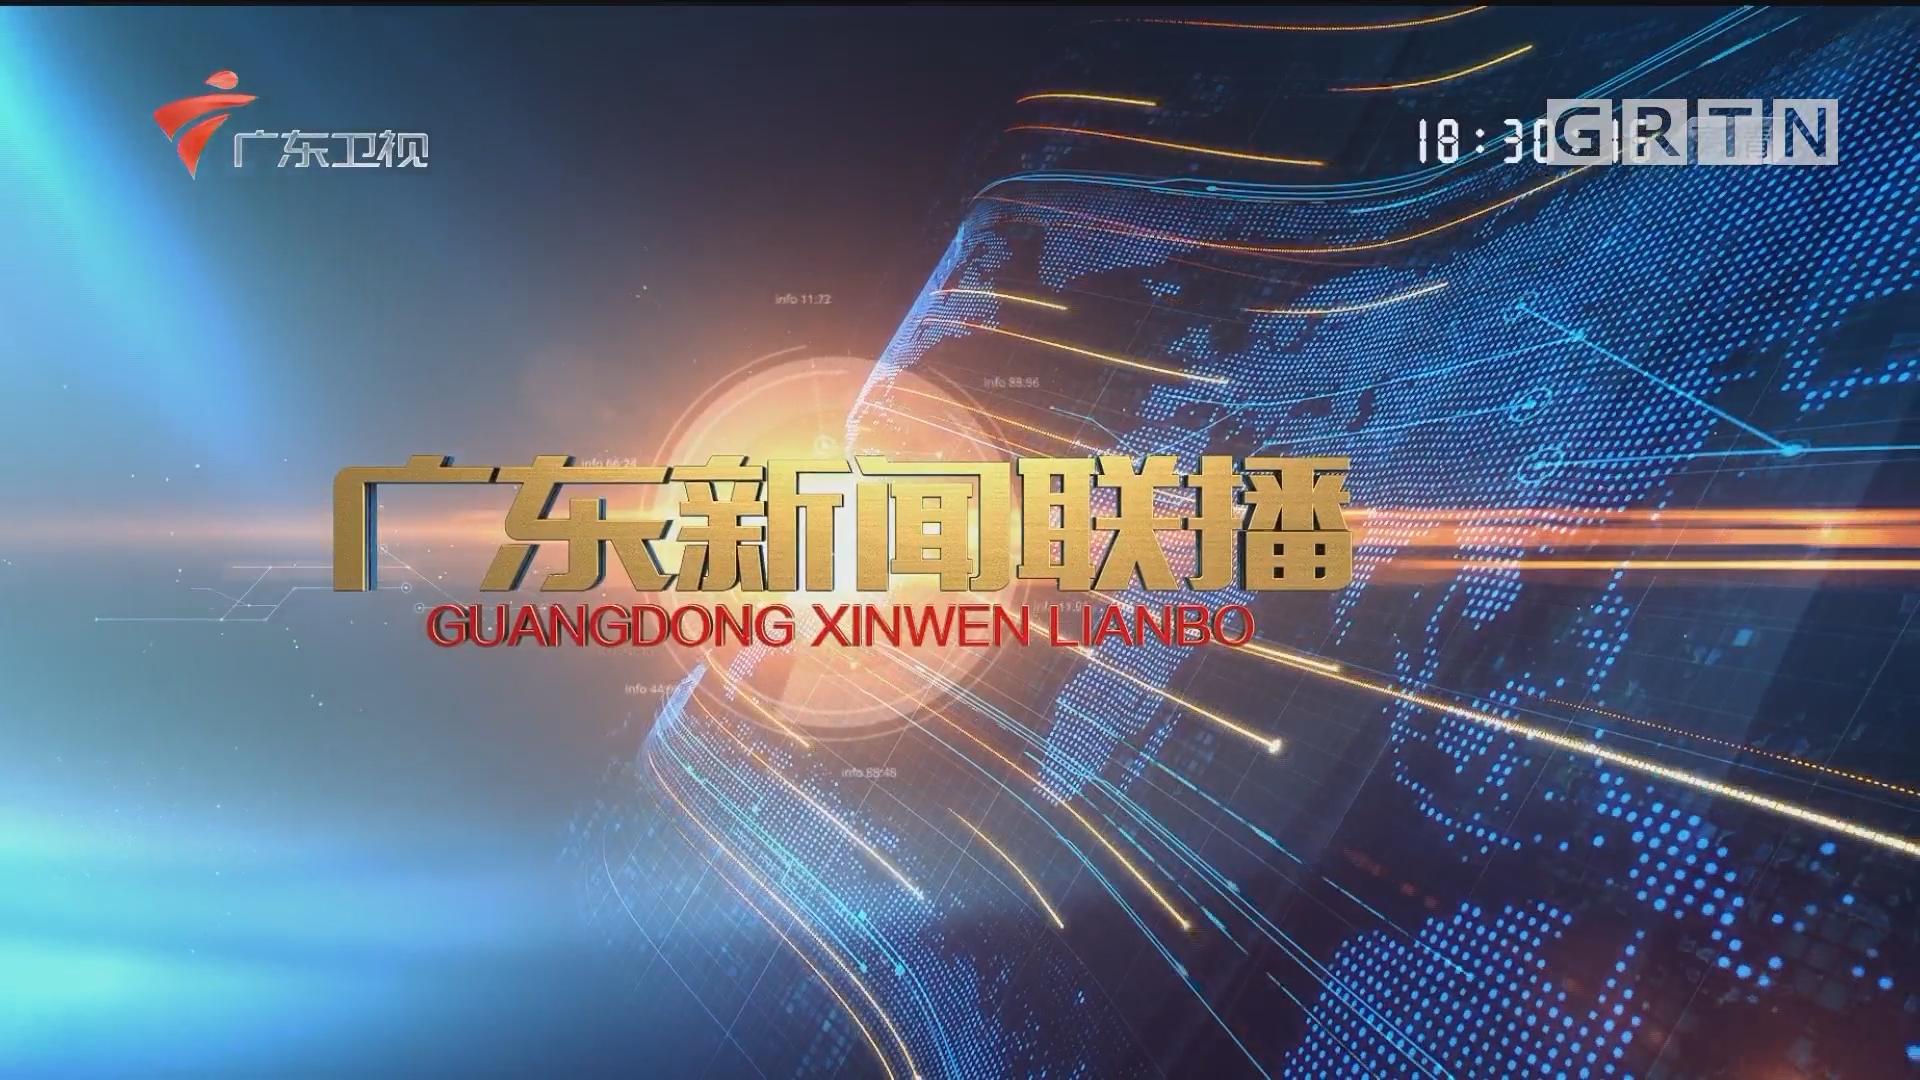 [HD][2017-10-30]广东新闻联播:阔步走进中国特色社会主义新时代——二论学习贯彻党的十九大精神